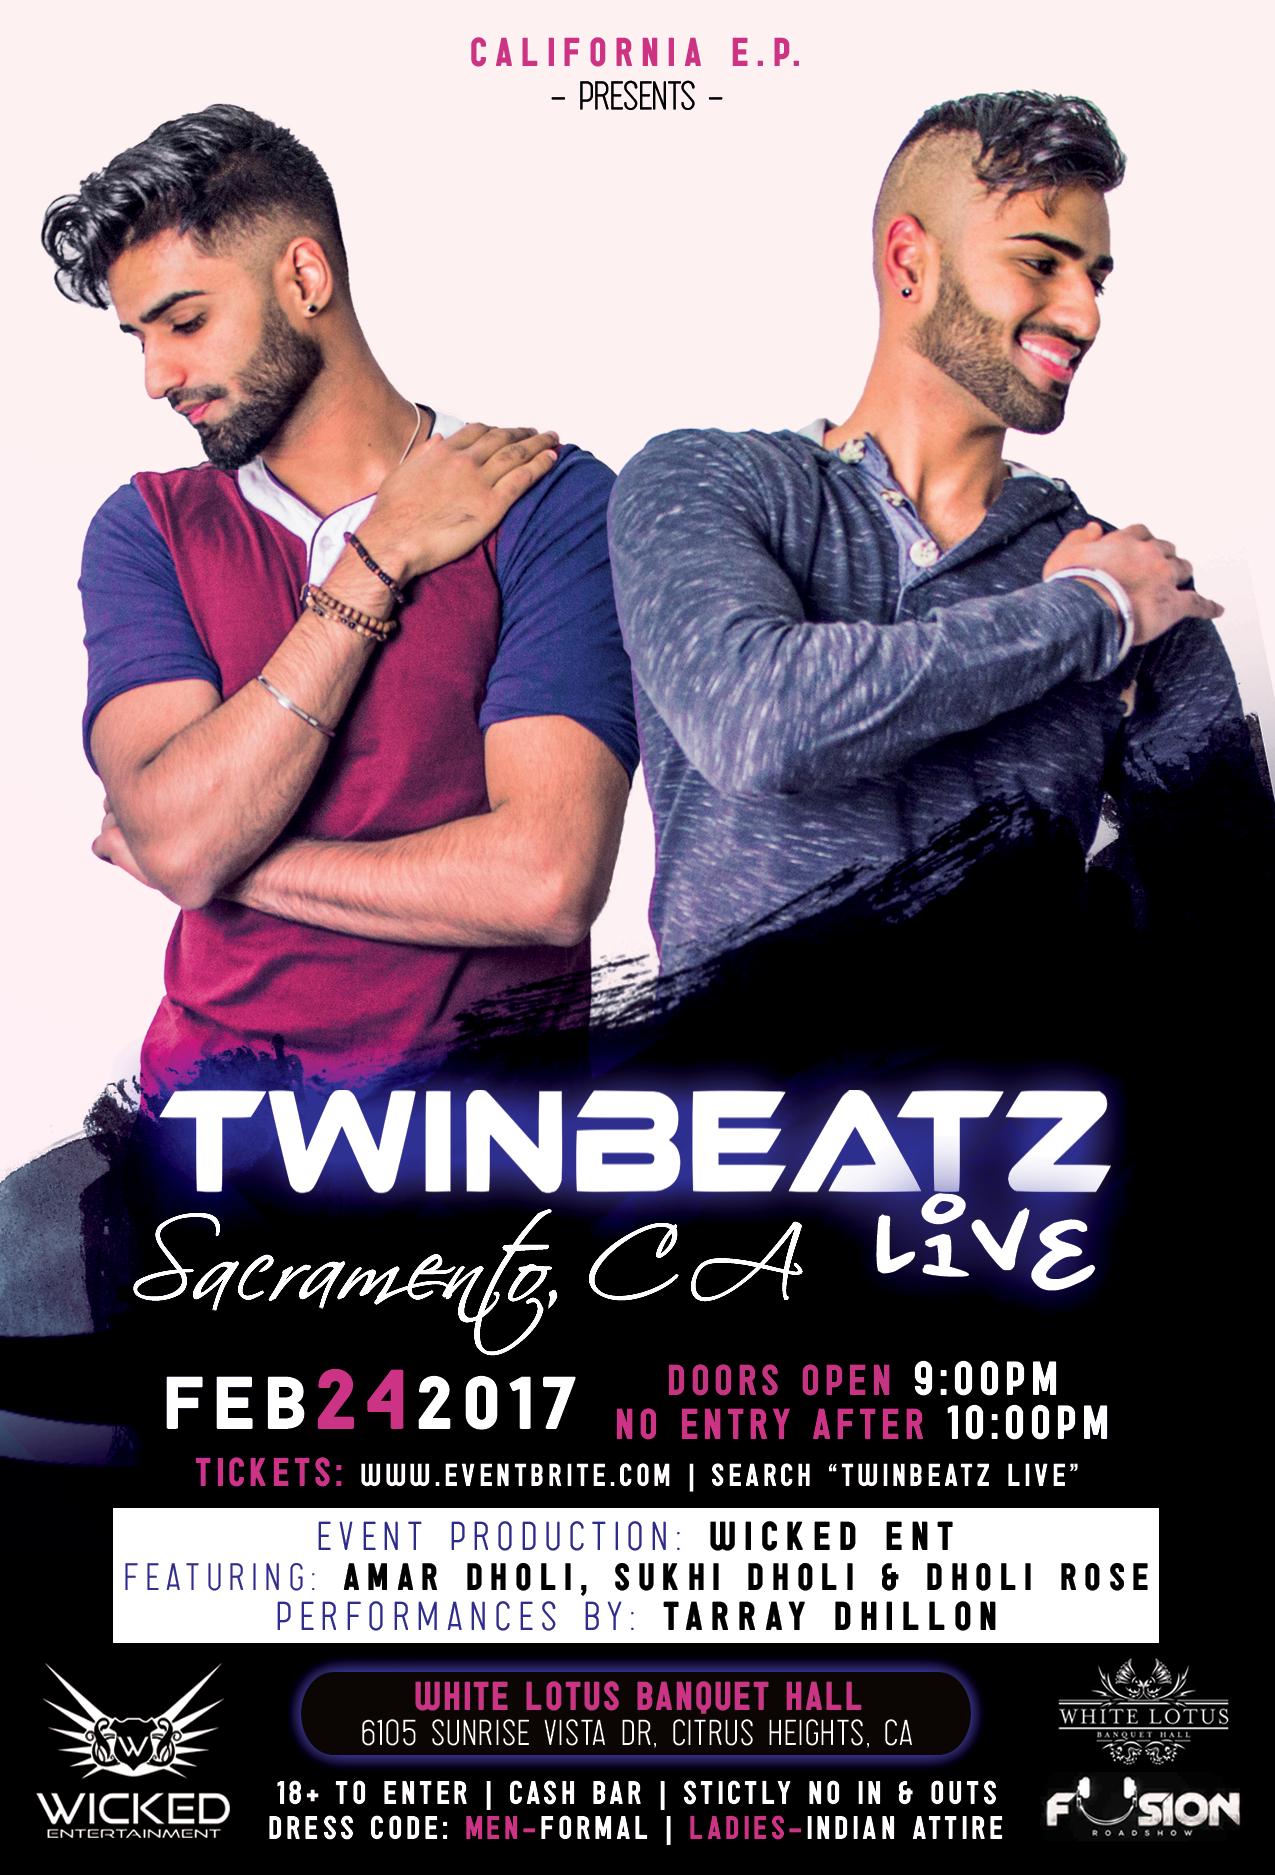 Twinbeatz Live at Sacramento